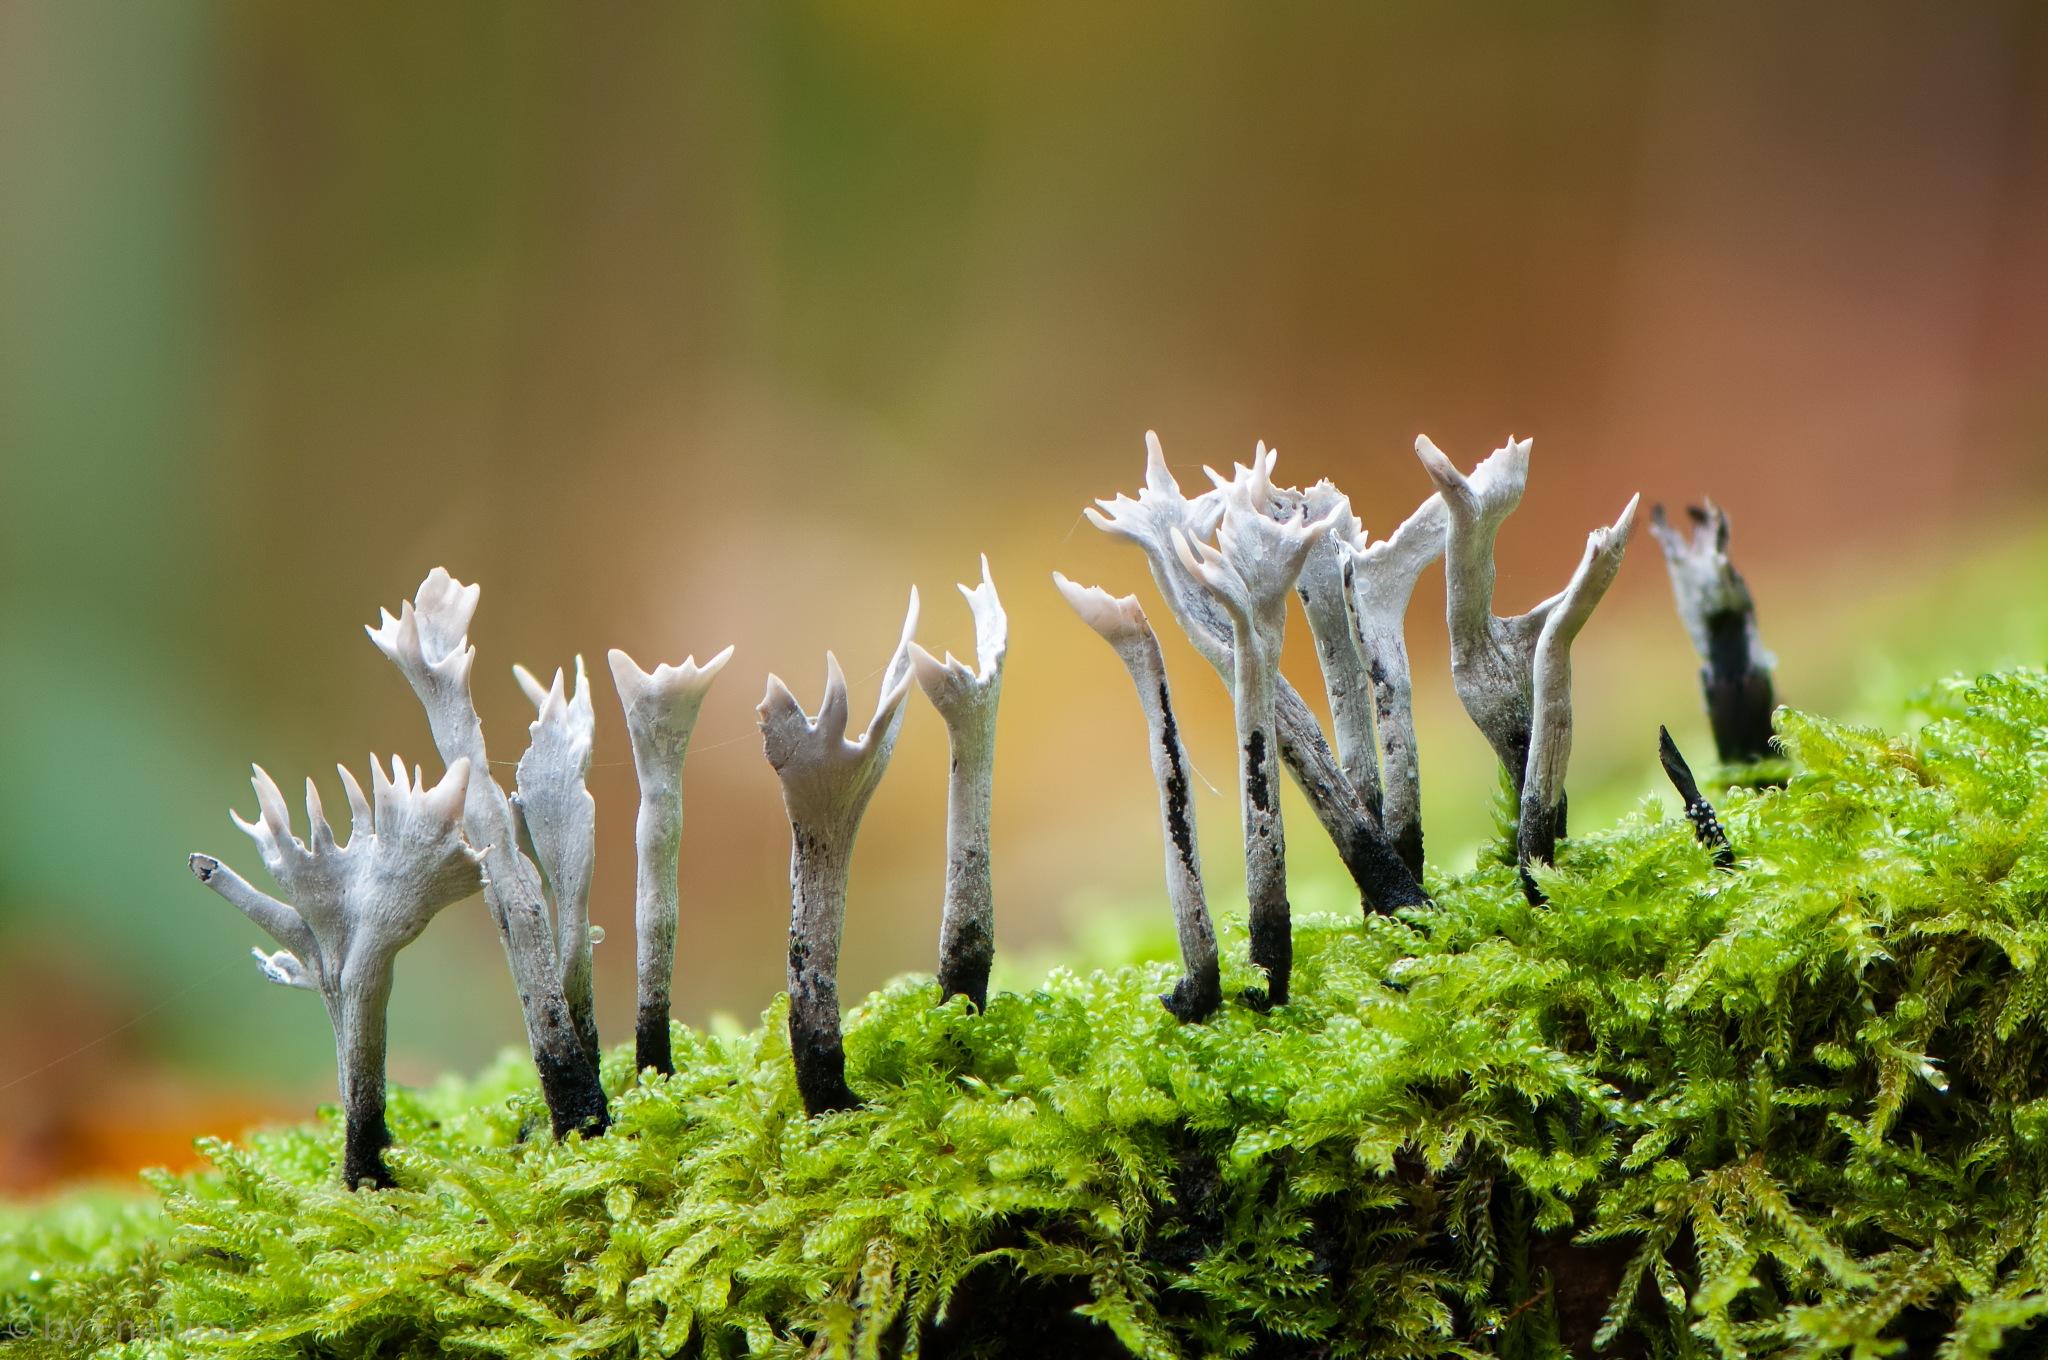 Strange Fungi by Enaruna